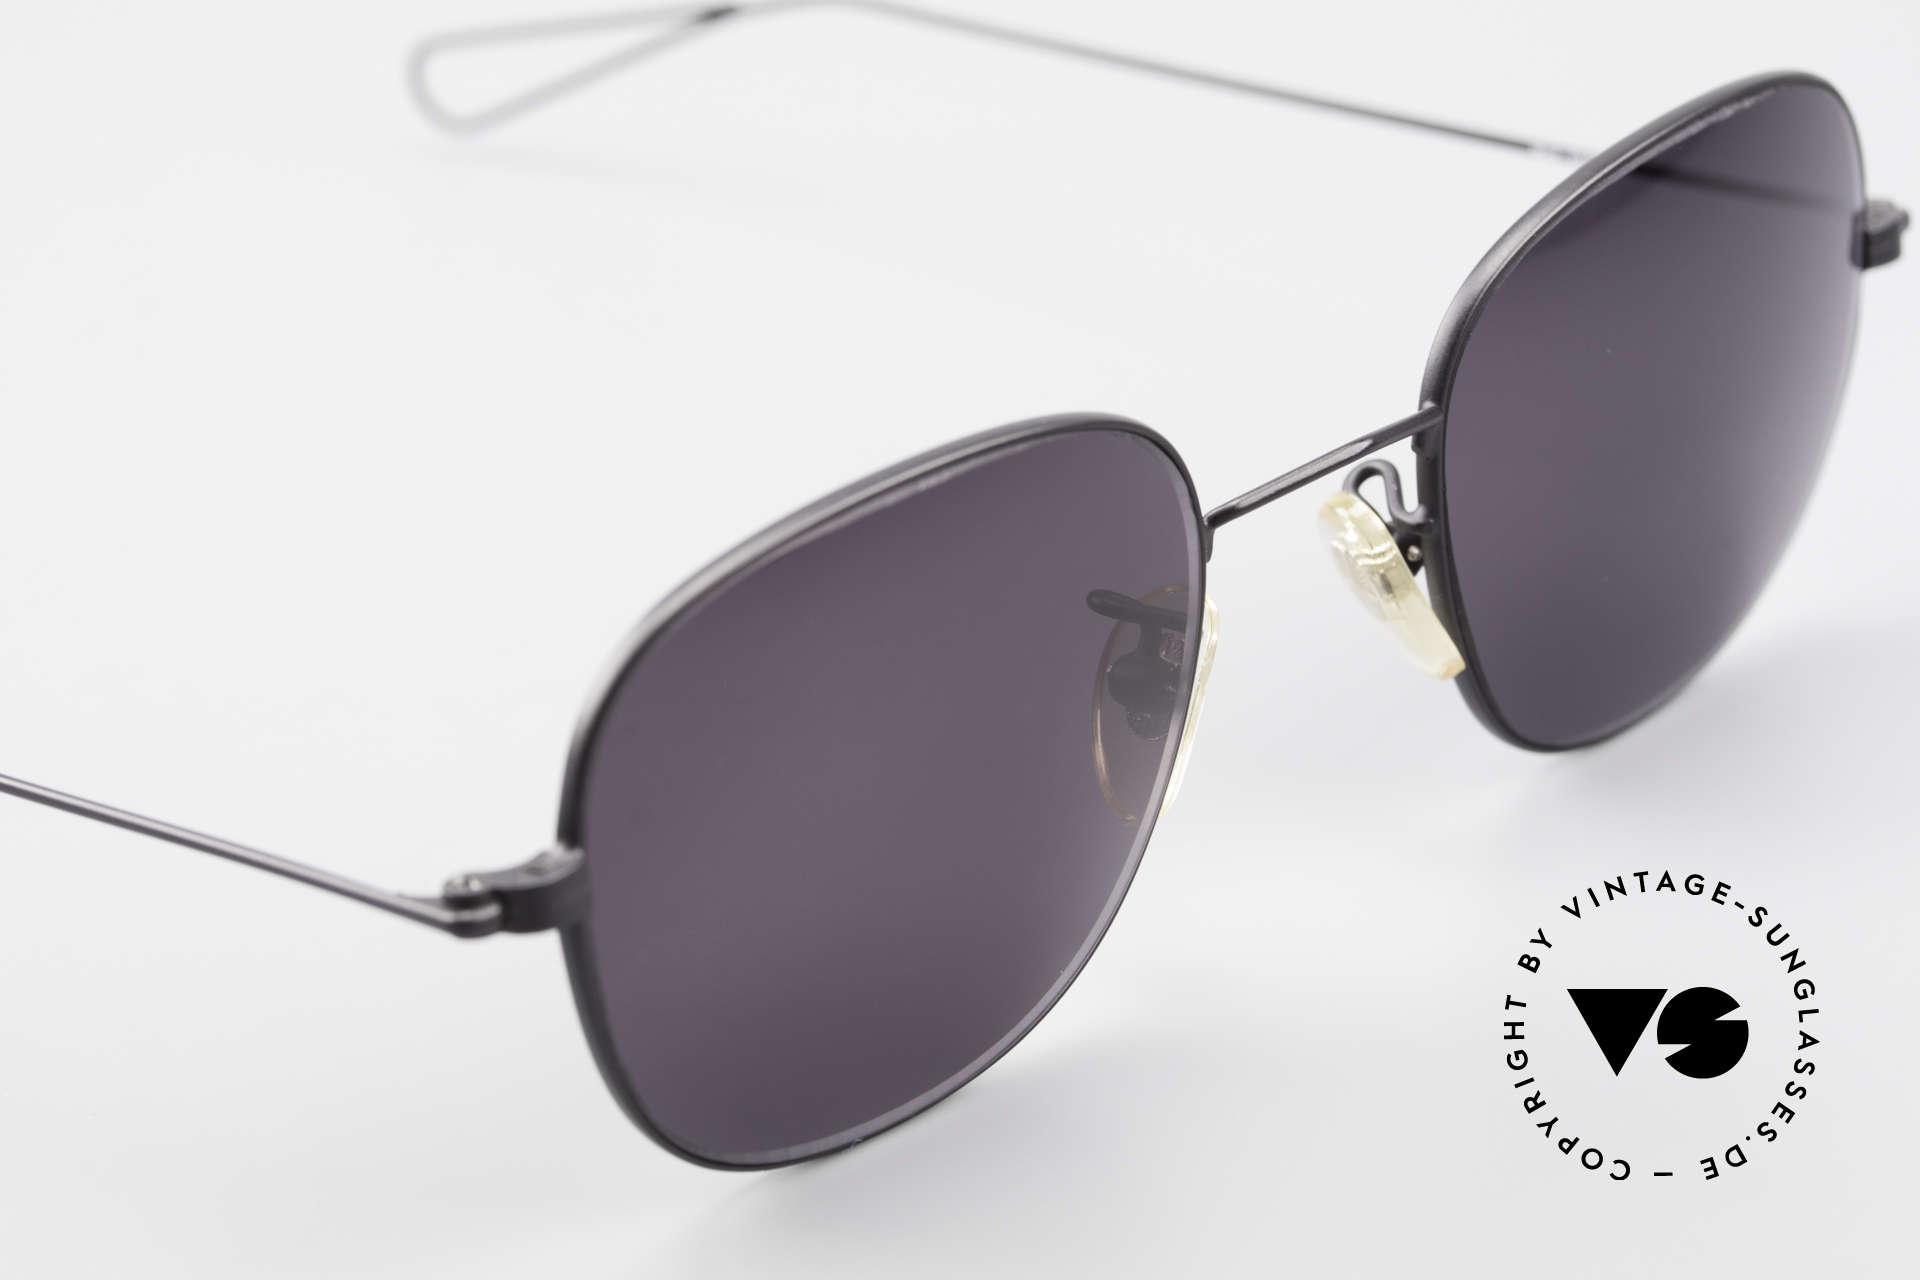 Cutler And Gross 0307 Old Vintage Designer Frame, never worn; like all our vintage Cutler & Gross eyewear, Made for Men and Women